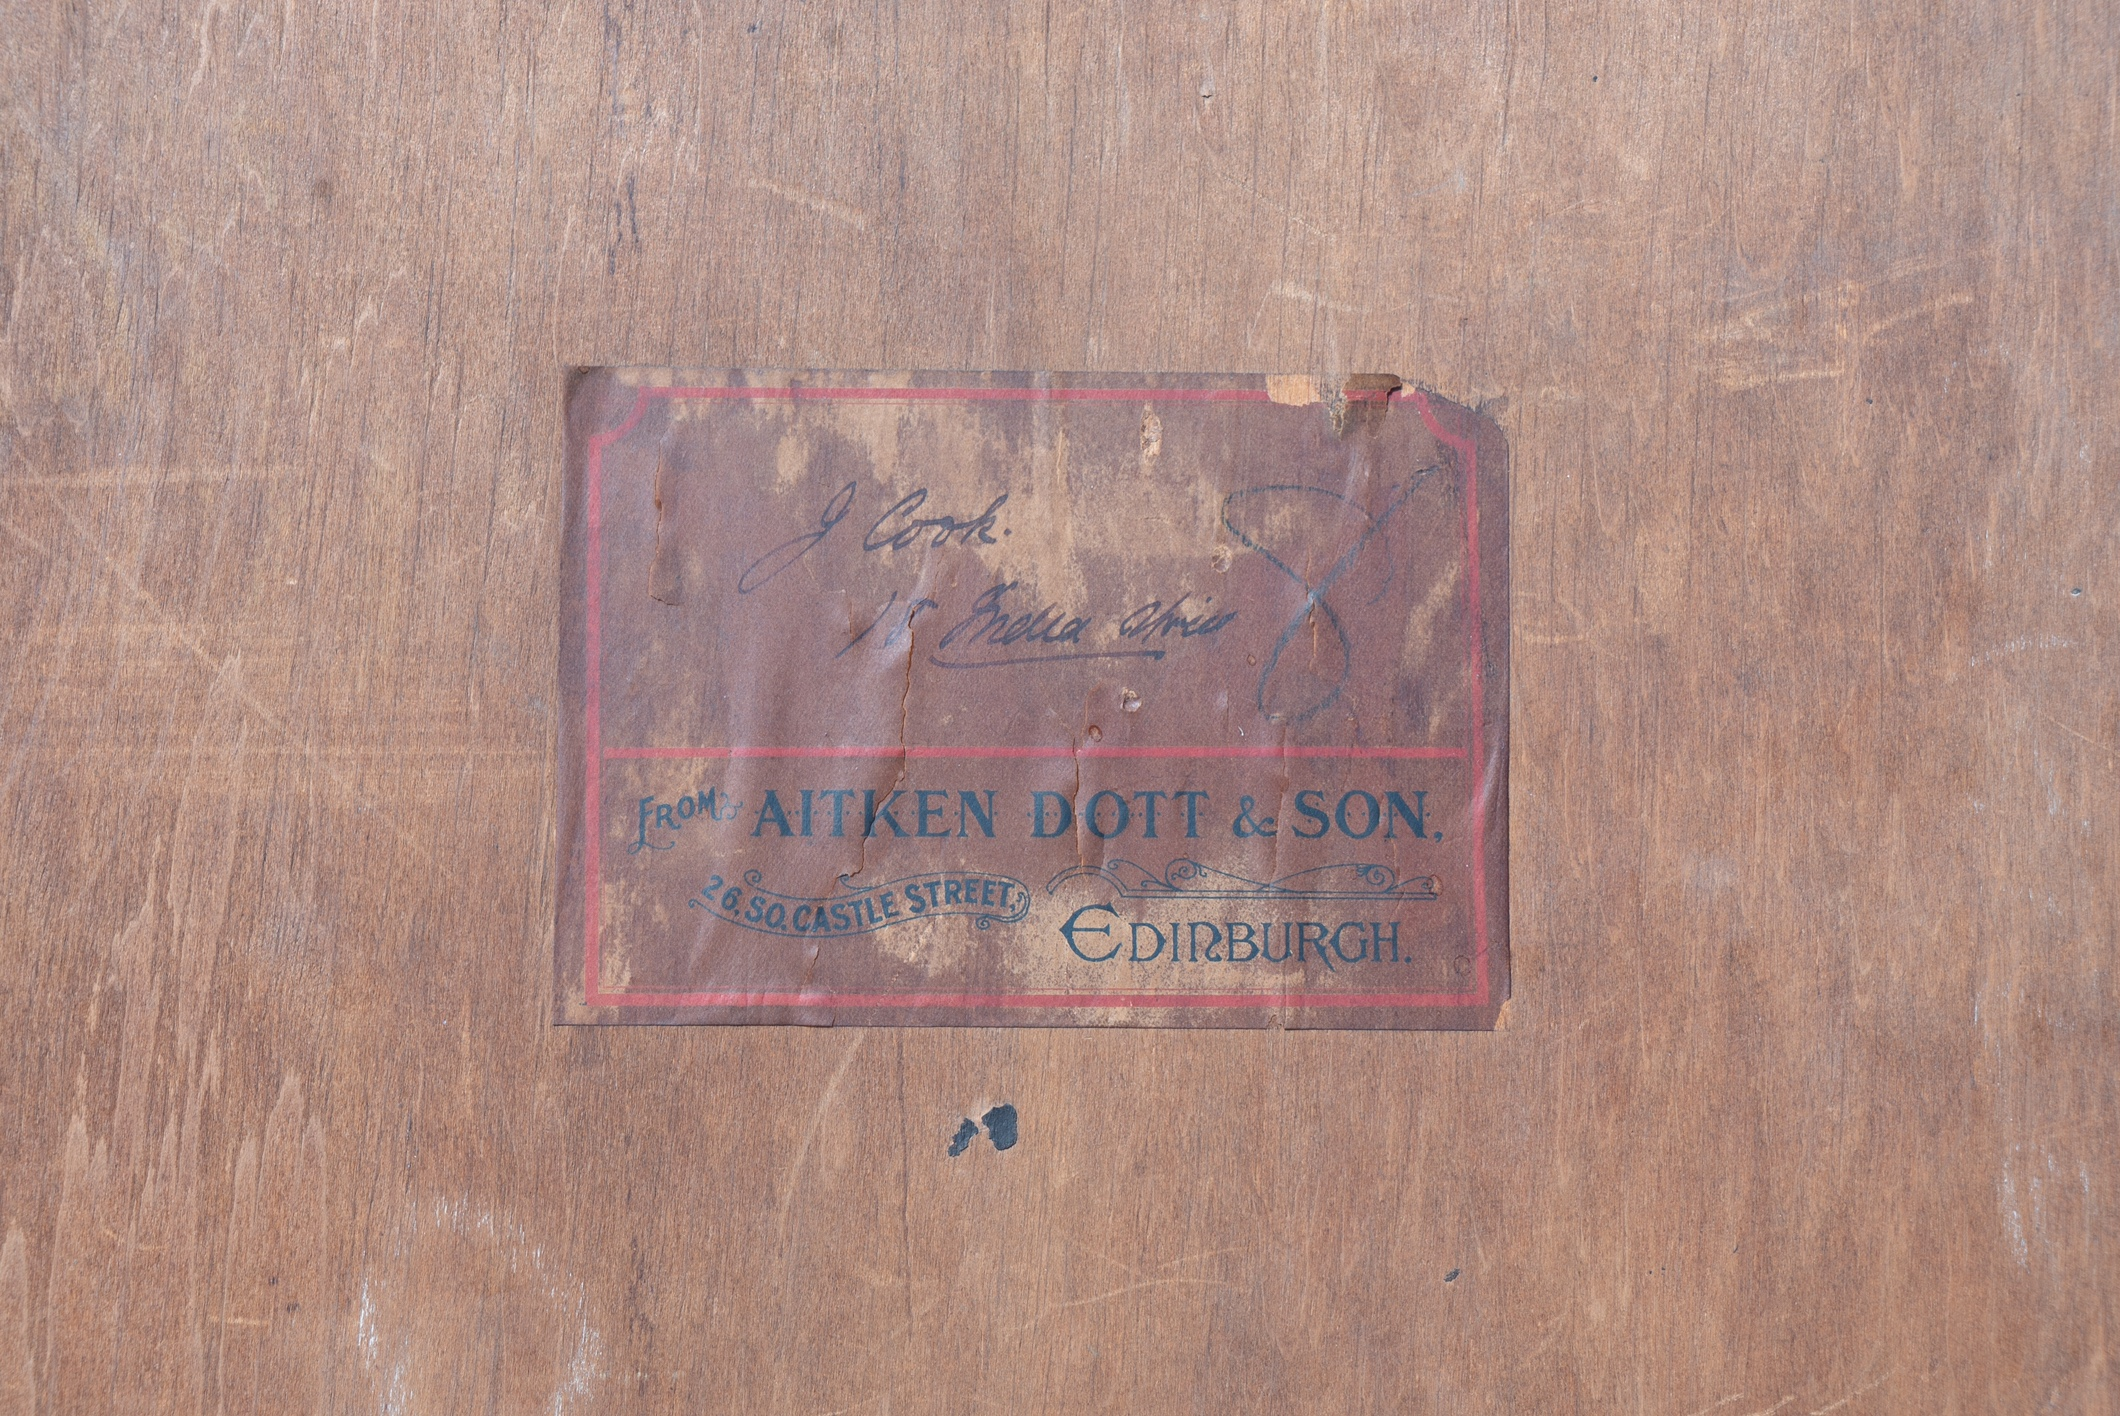 JAMES PATERSON RSA RSW (SCOTTISH 1854-1932), Portrait of J Cook 18 India Street, signed Conté - Image 3 of 4